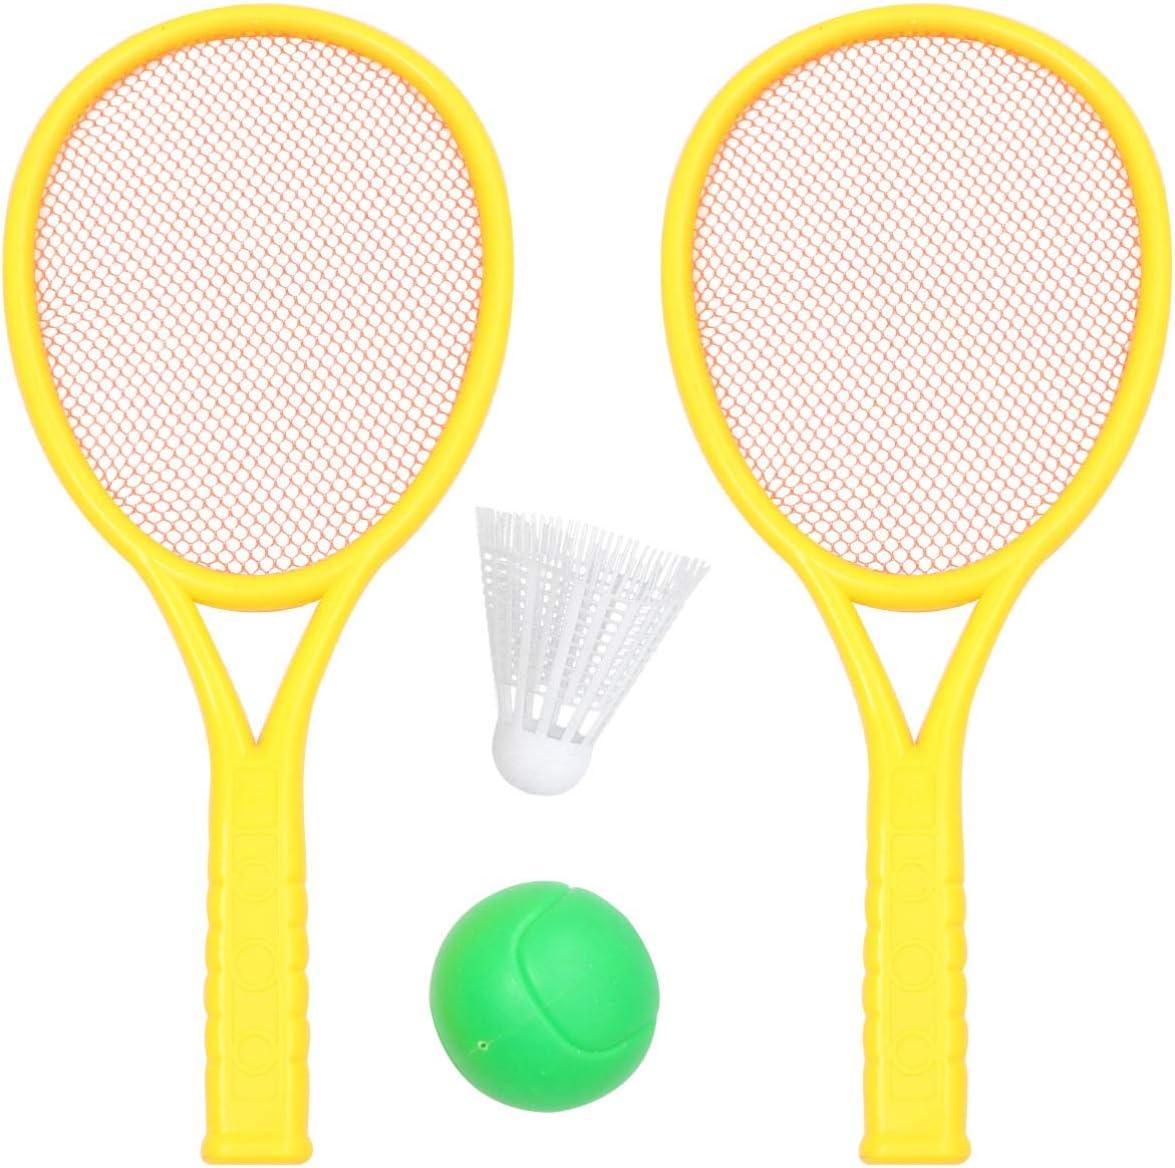 Plastic Badminton Tennis Rackets Balls Set,Kids Racket Wakauto Kids Tennis Racket Set